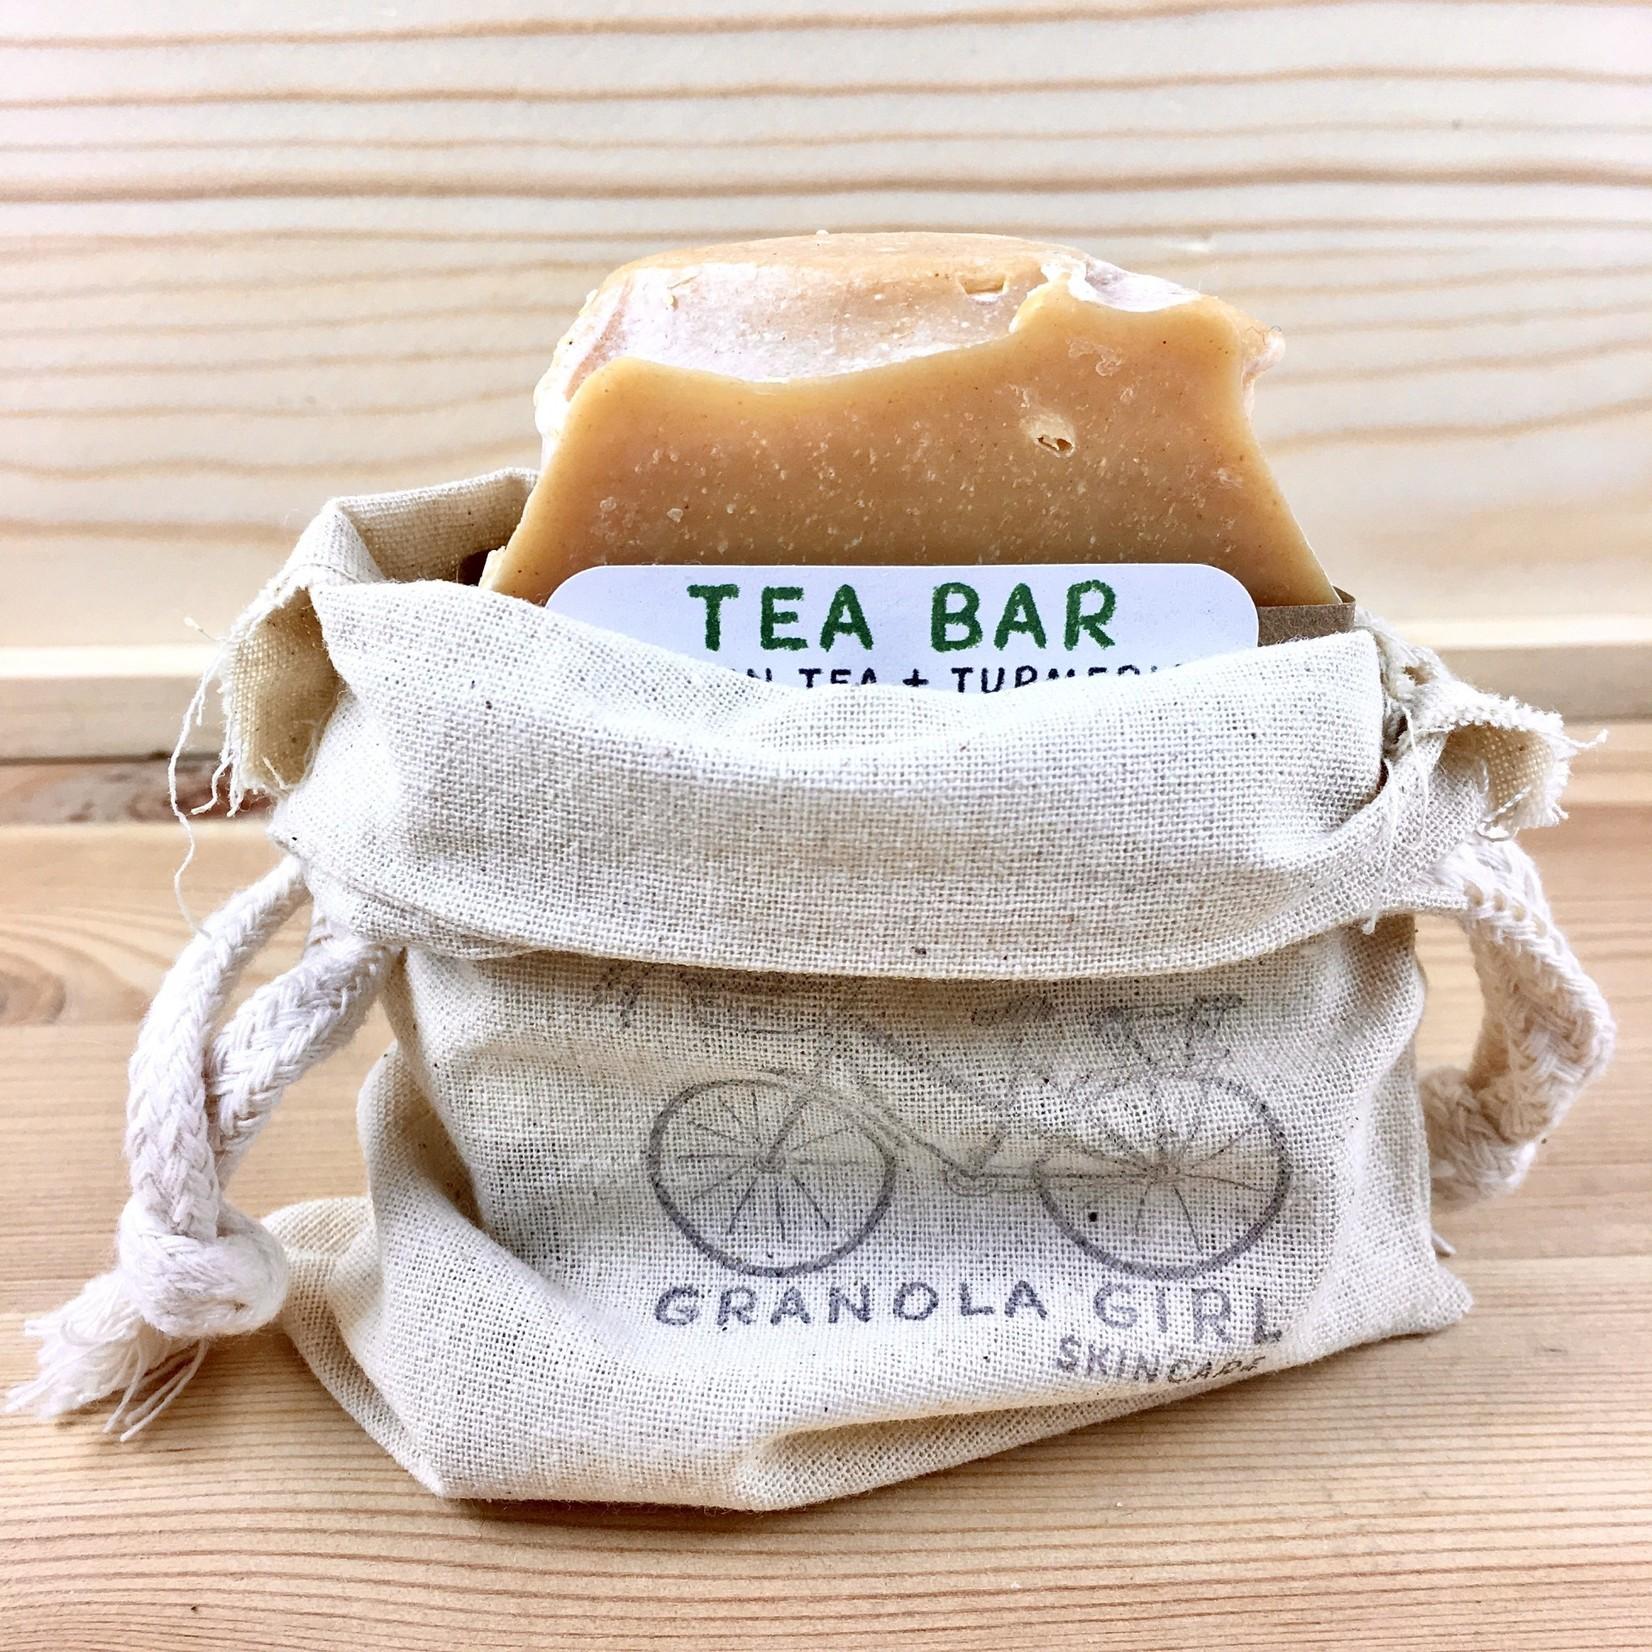 Granola Girl Skincare /Teehaus Bath + Body (QO) Soap Saver Canvas Drawstring Pouch